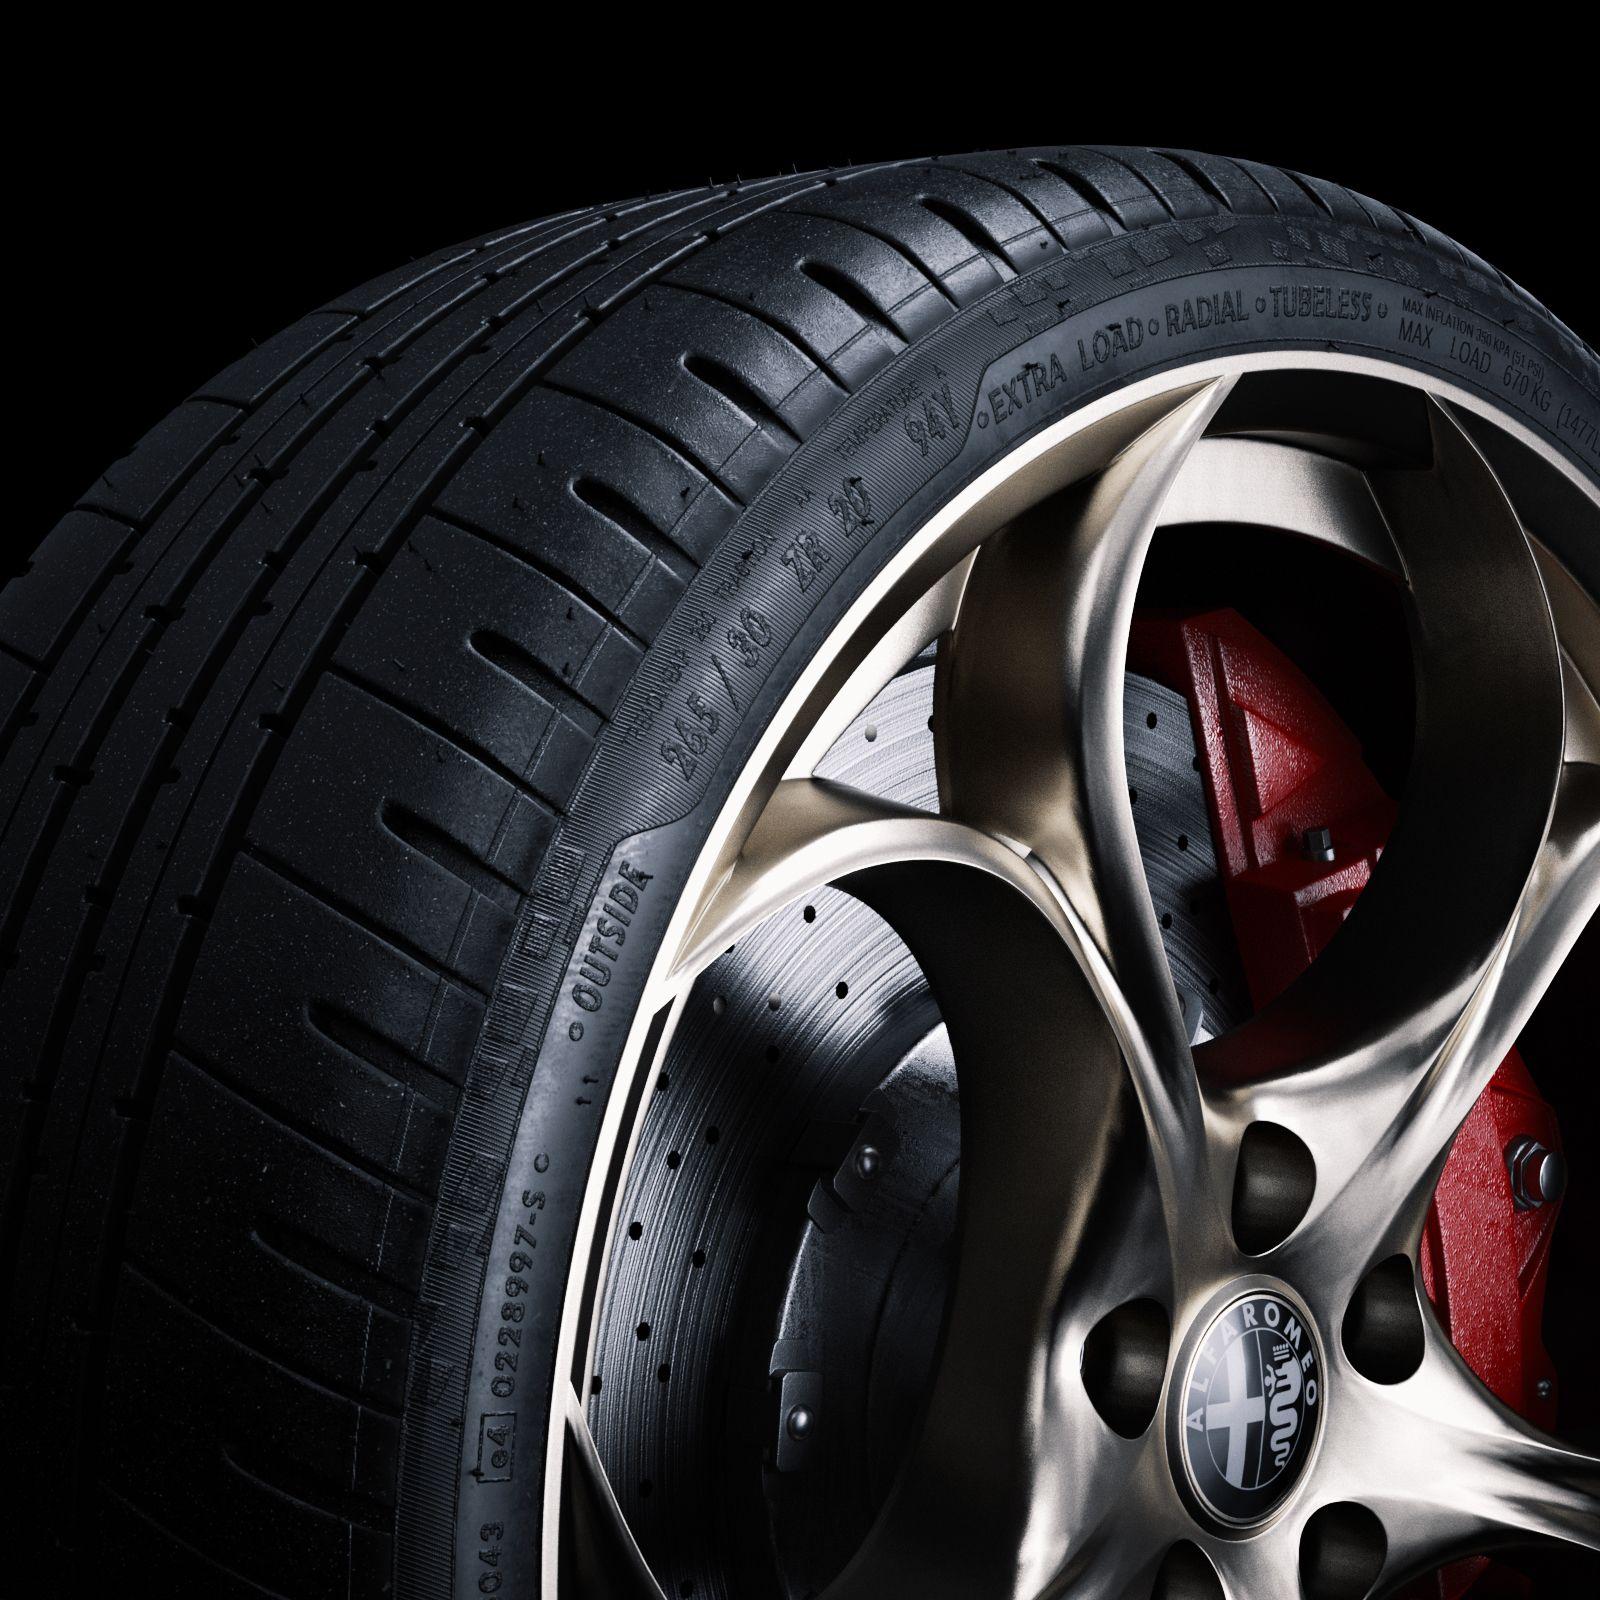 Alfa Romeo Giulia Tire Full CGI & Retouching on Behance